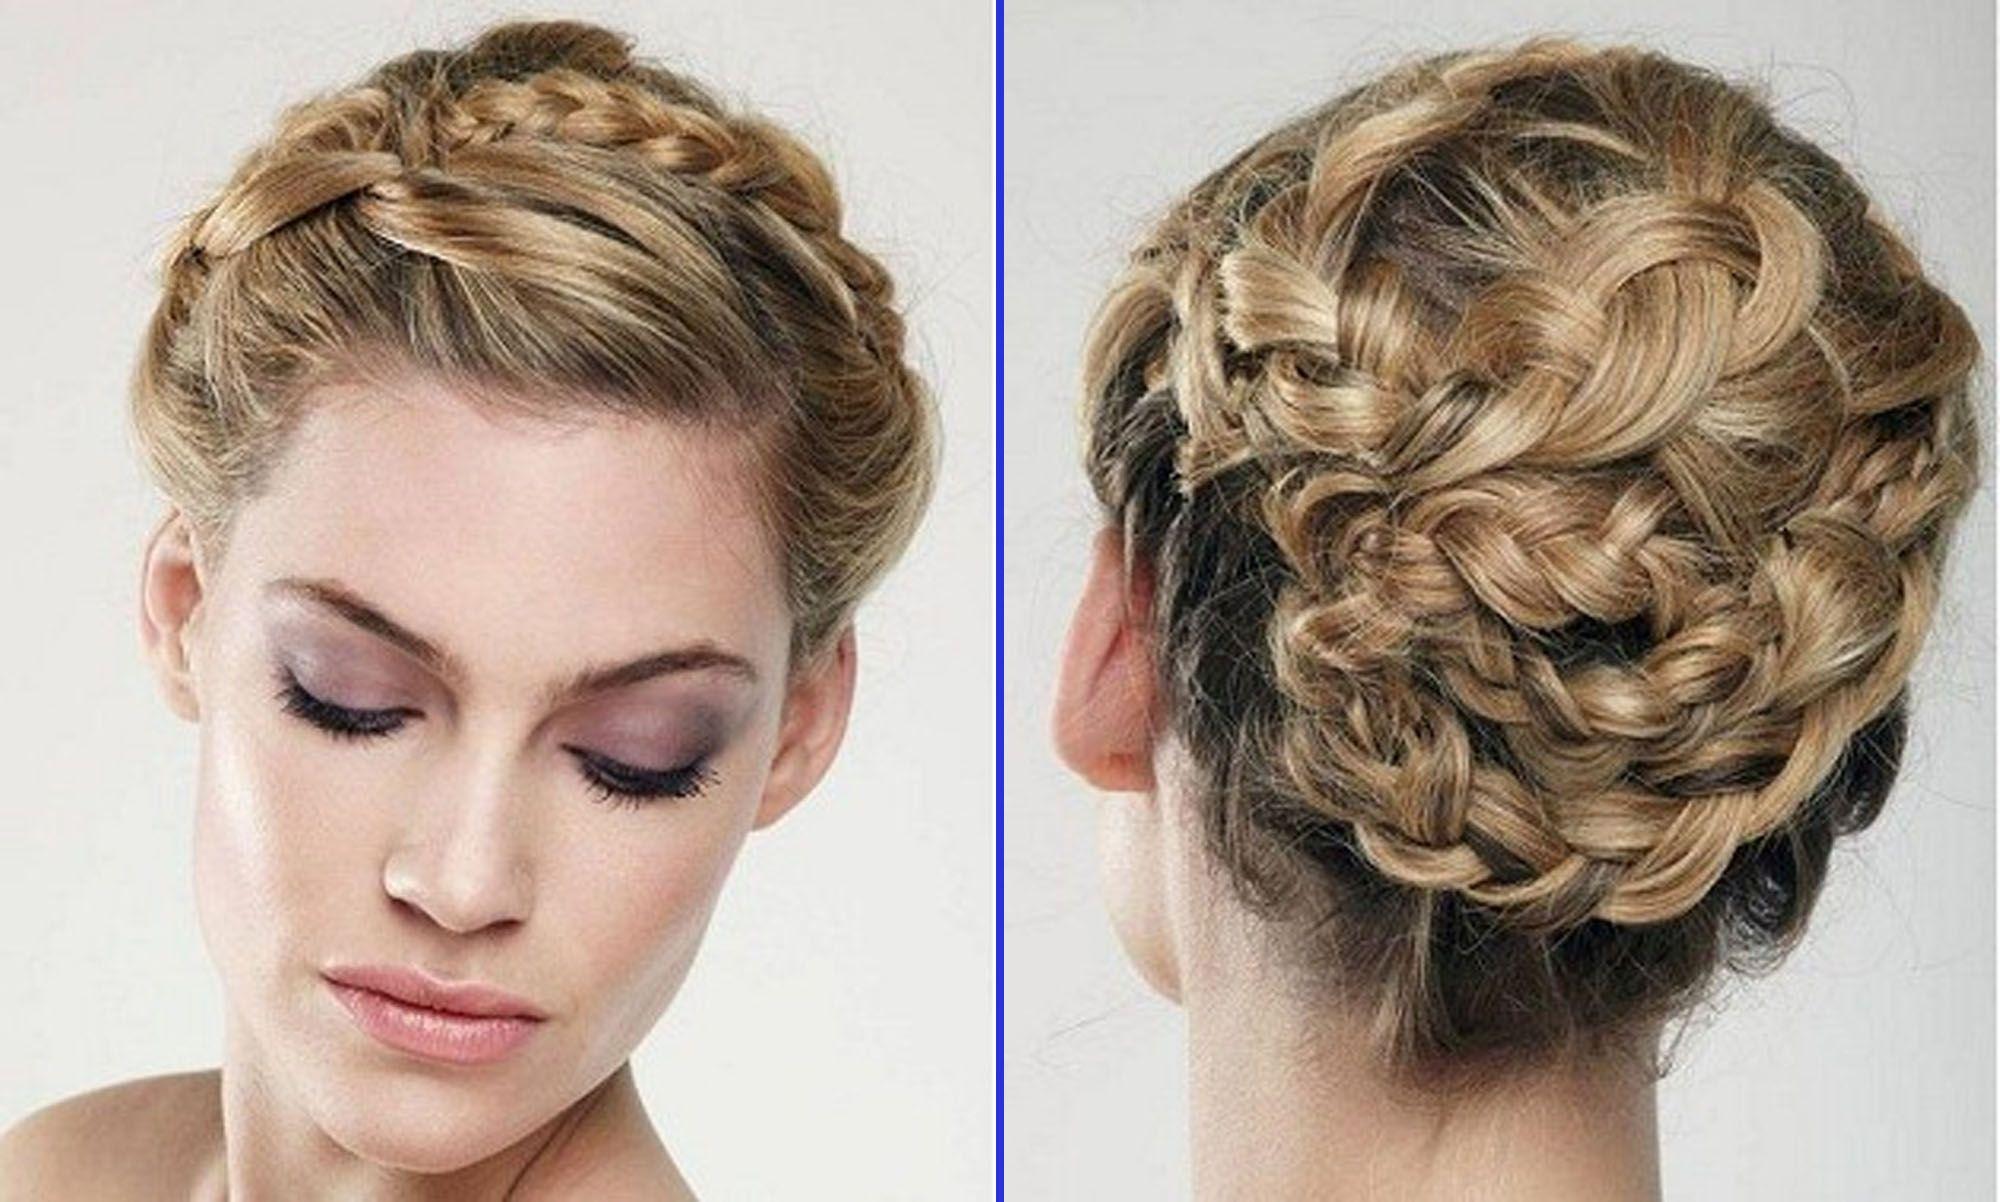 Phenomenal Wedding Braid Hairstyle Wedding Planning Hair Pinterest Hairstyle Inspiration Daily Dogsangcom